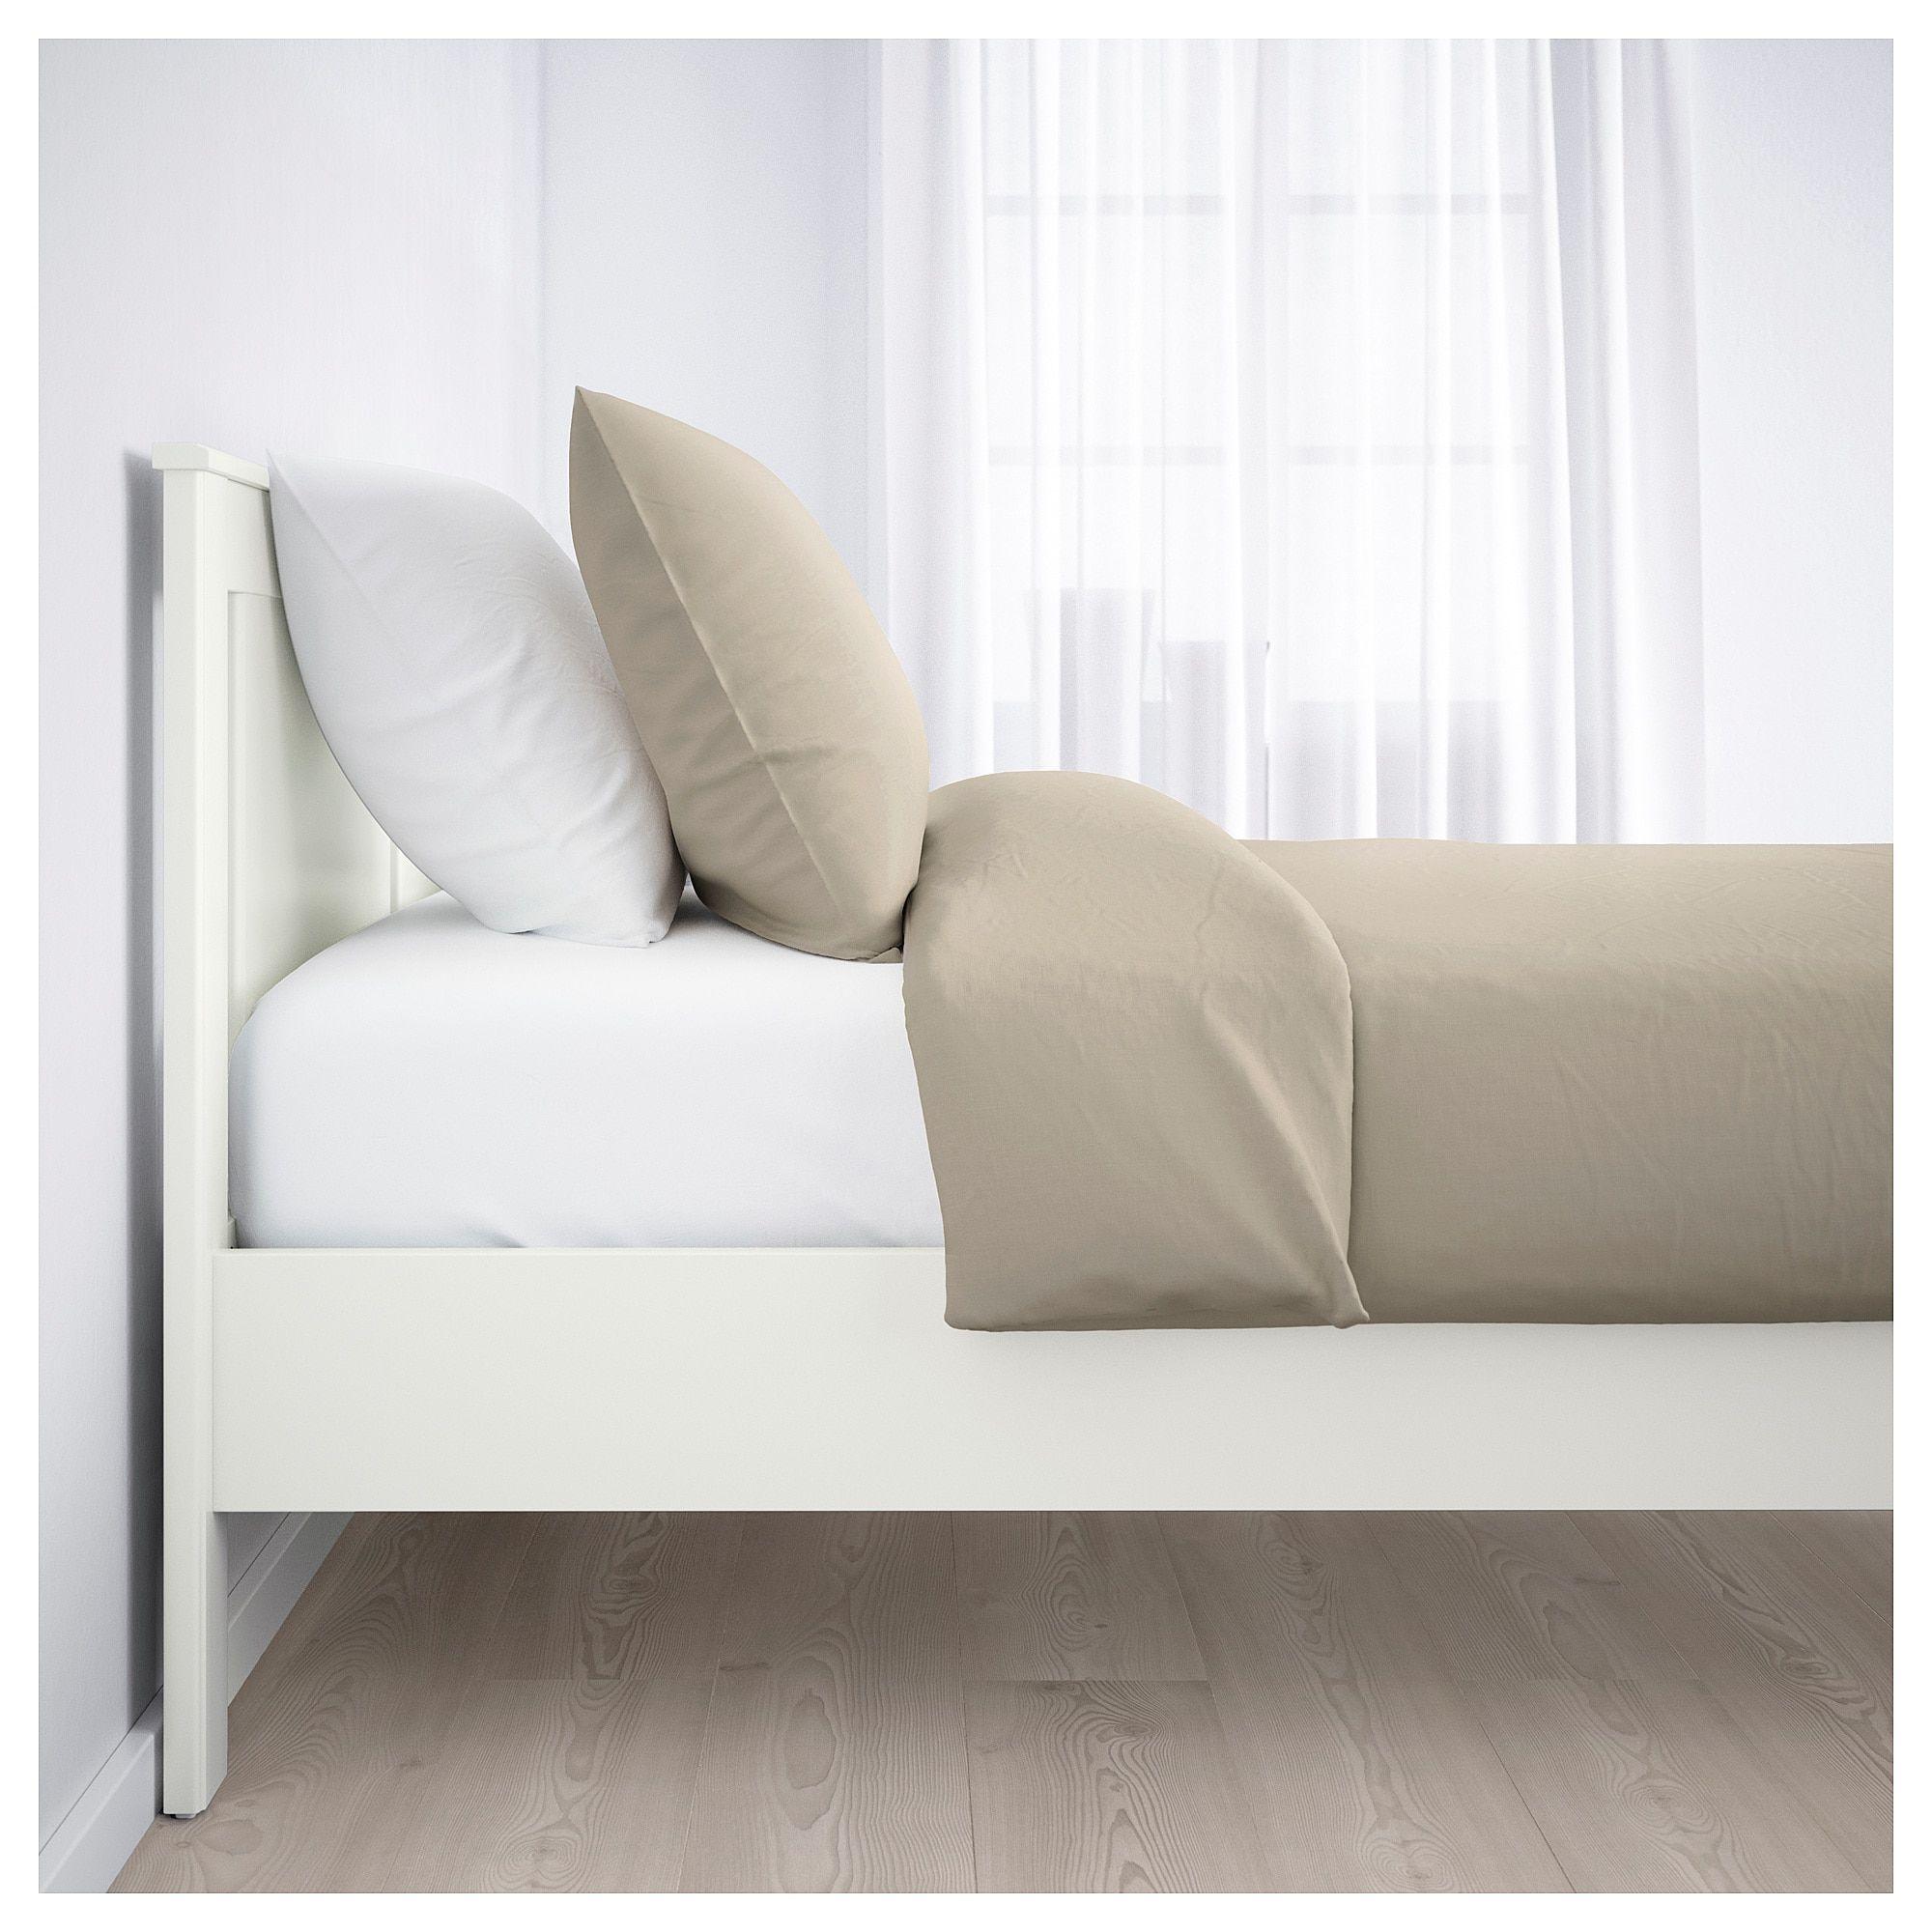 IKEA US Furniture and Home Furnishings in 2020 White